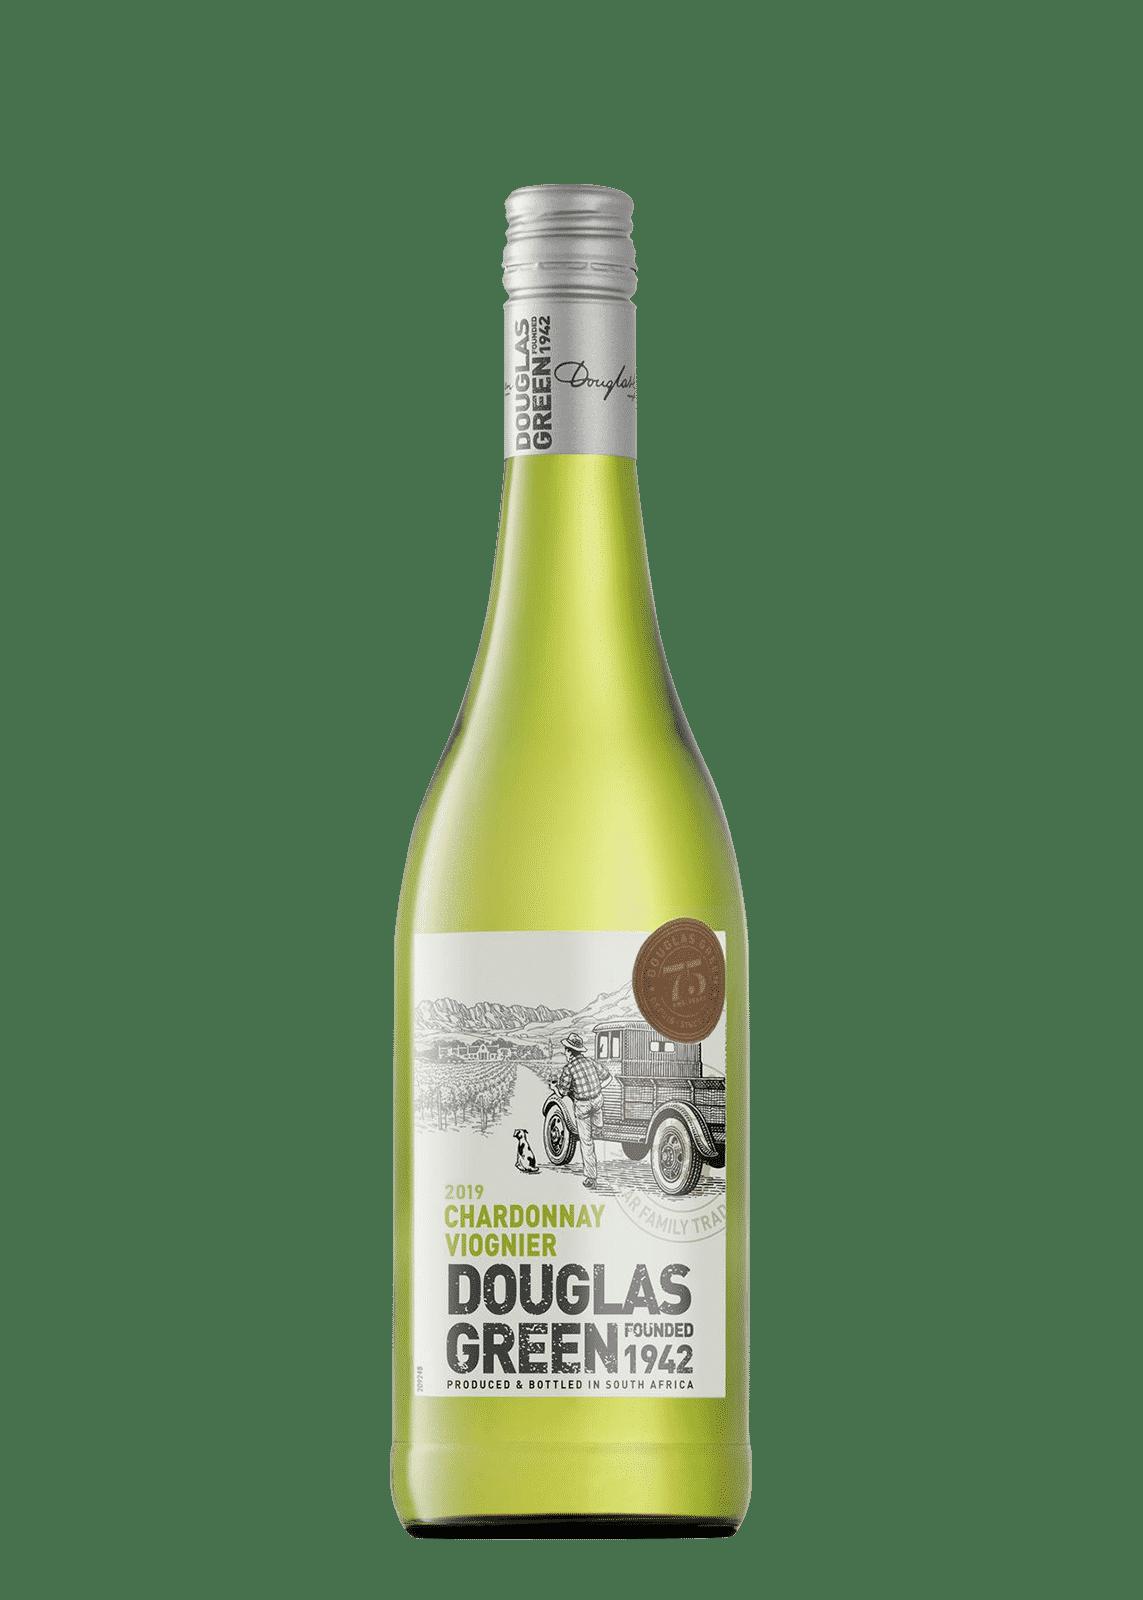 Douglas Green Chardonnay Viognier